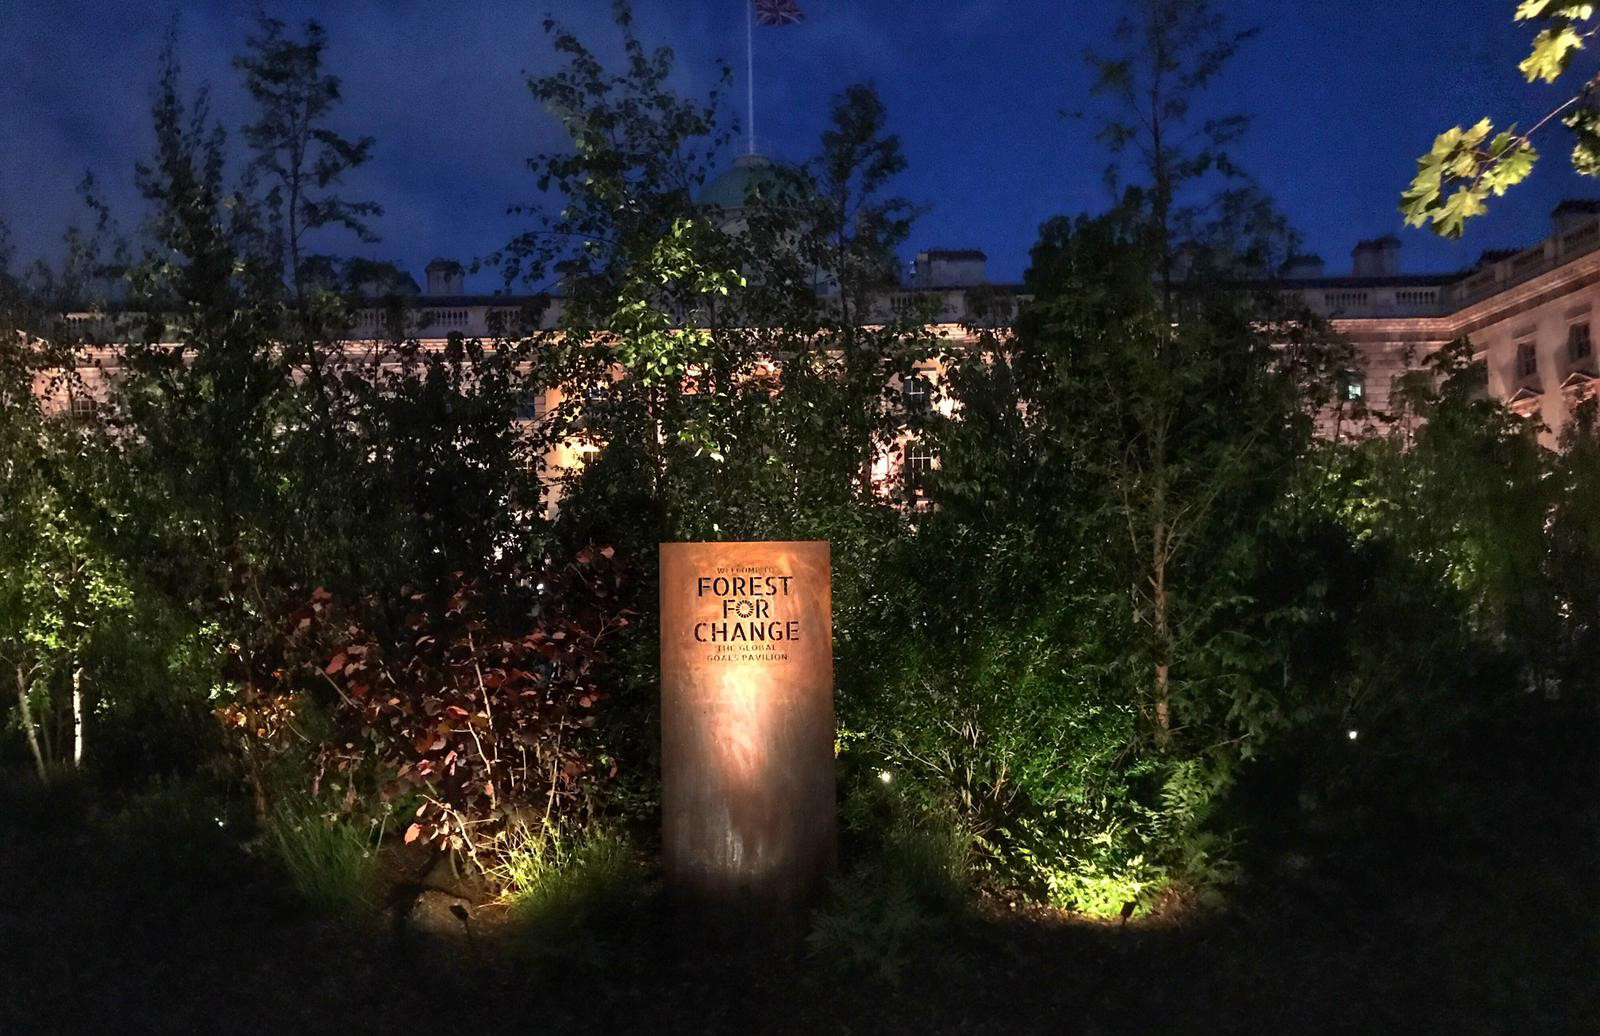 lighting up forest for change sign